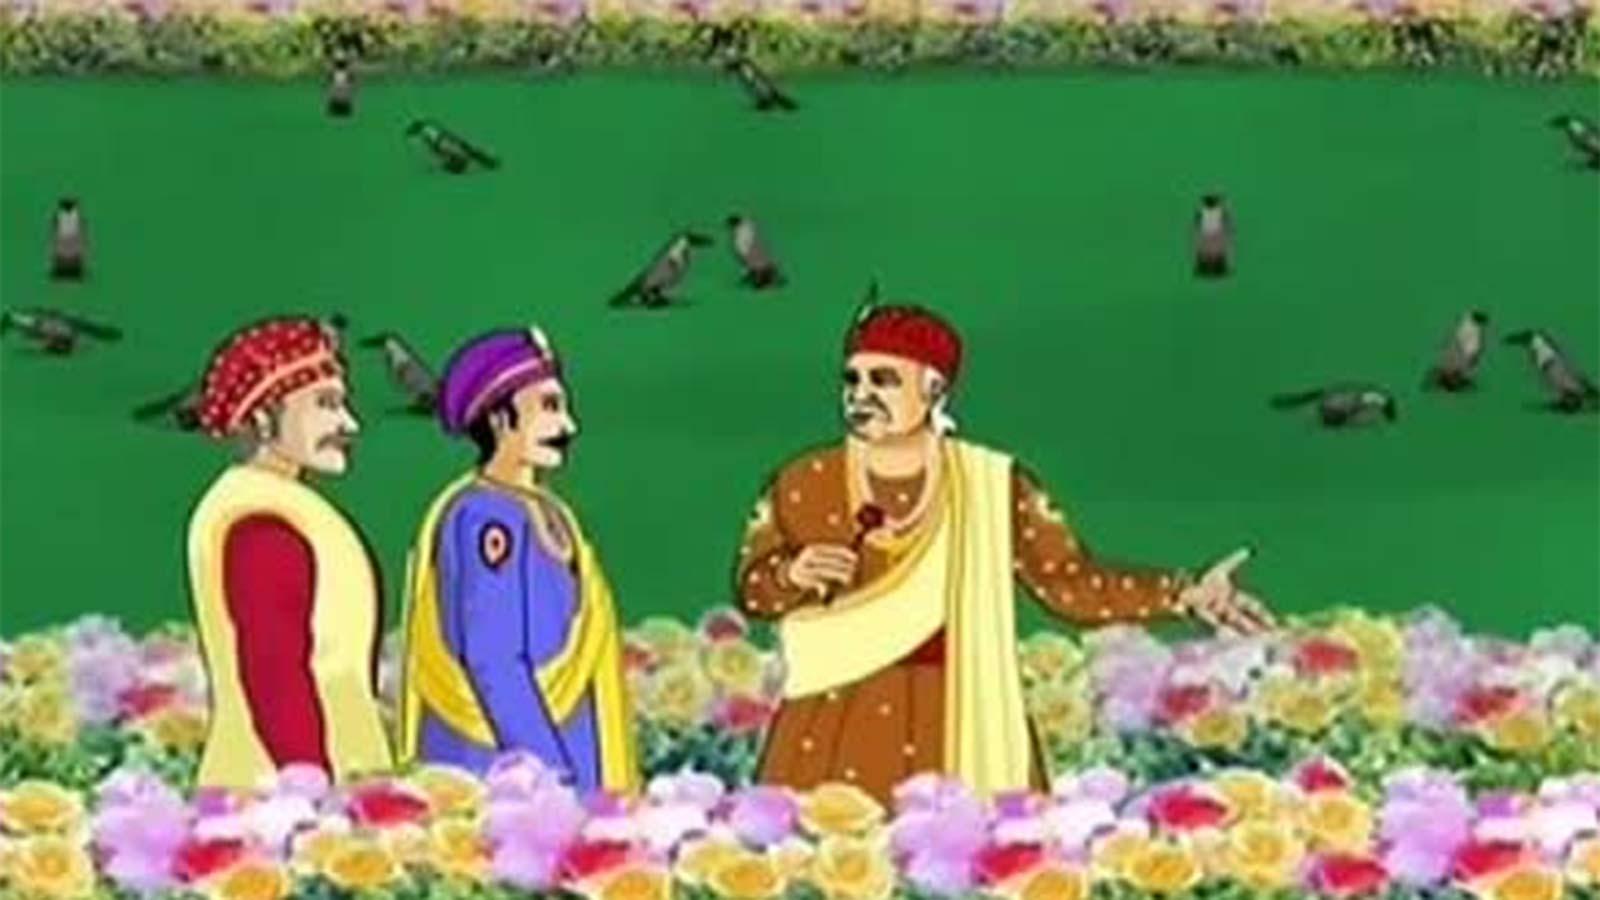 Animated Sexy Stories kids popular story 'akbar birbal ki kahani' - hindi animated stories for  kids